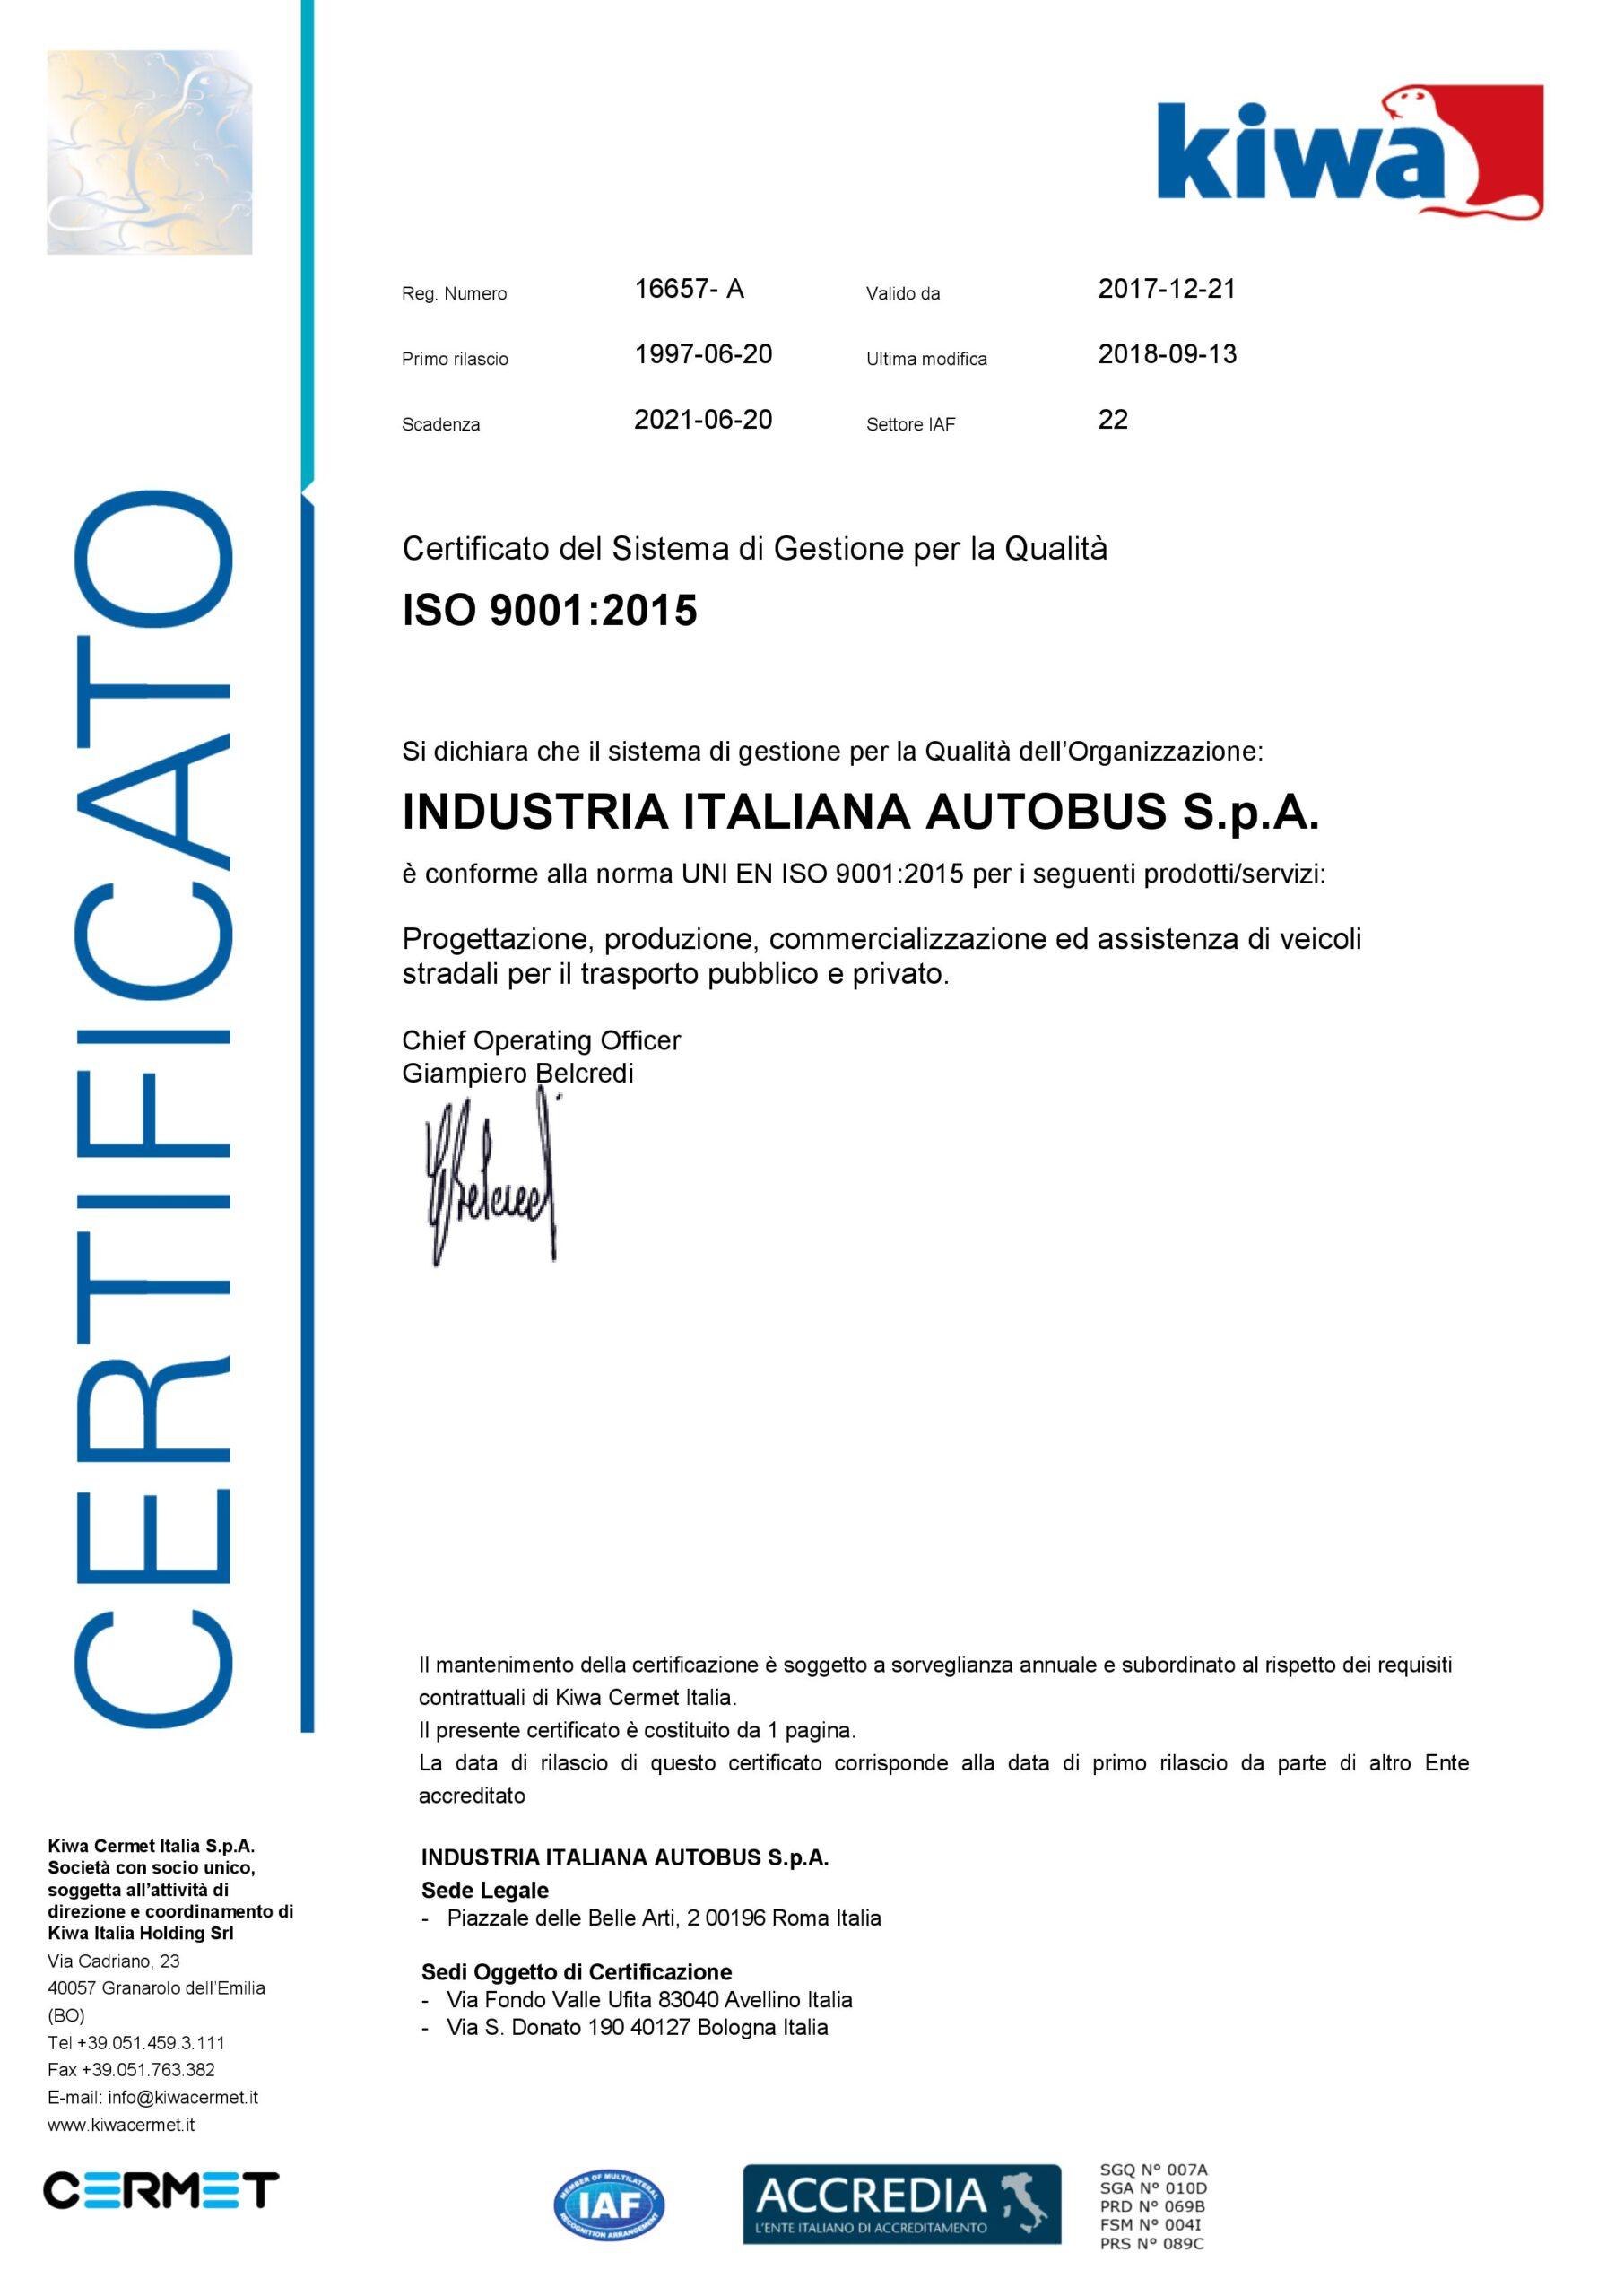 https://www.industriaitalianaautobus.com/wp-content/uploads/2021/02/Certificato-ISO-9001-2015-scaled.jpg